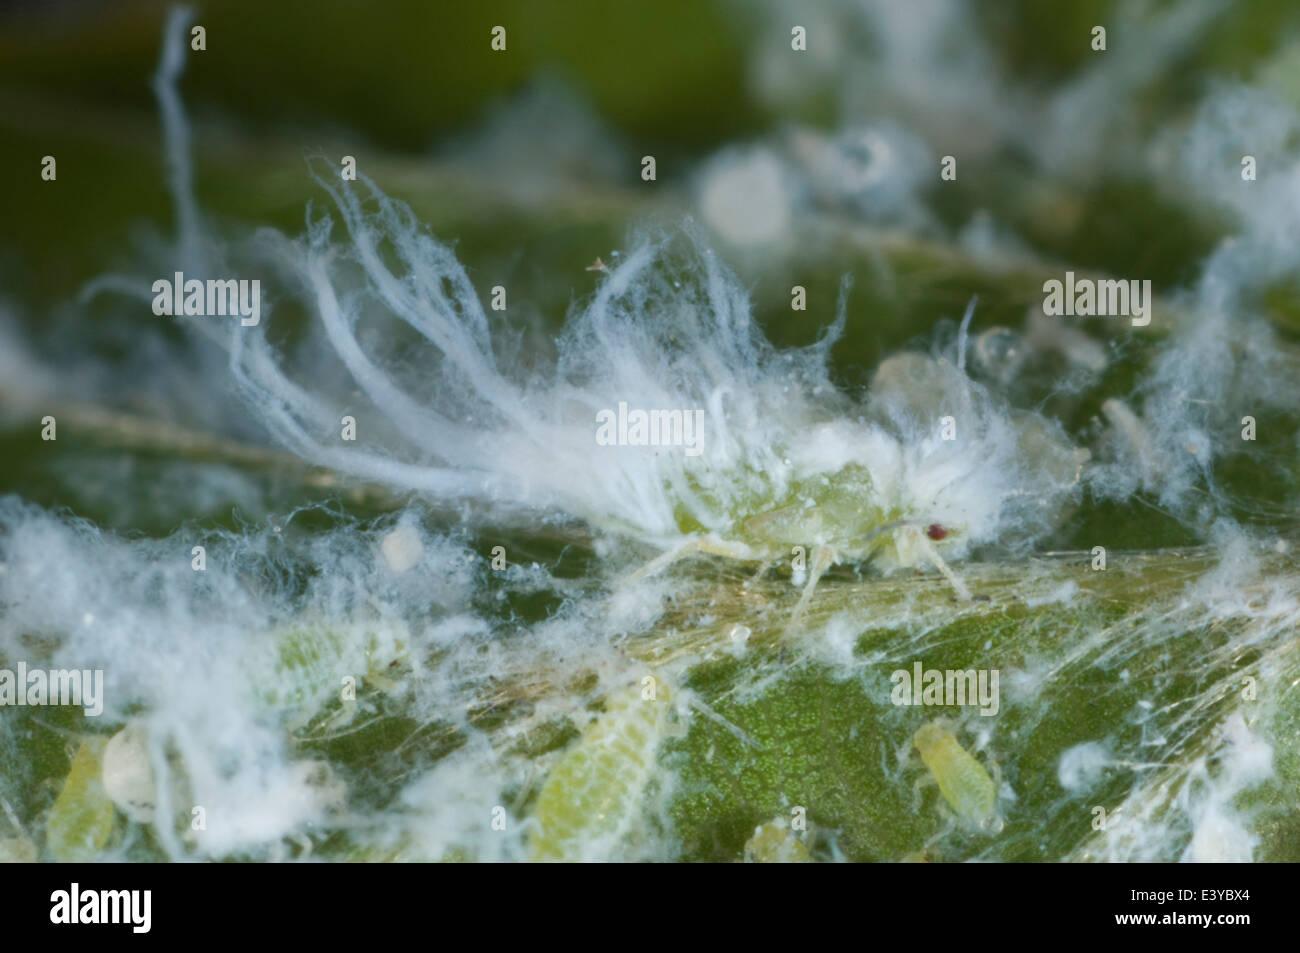 Mikrophotographie wollig Buche Blattlaus Phyllaphis Fagi Kolonie